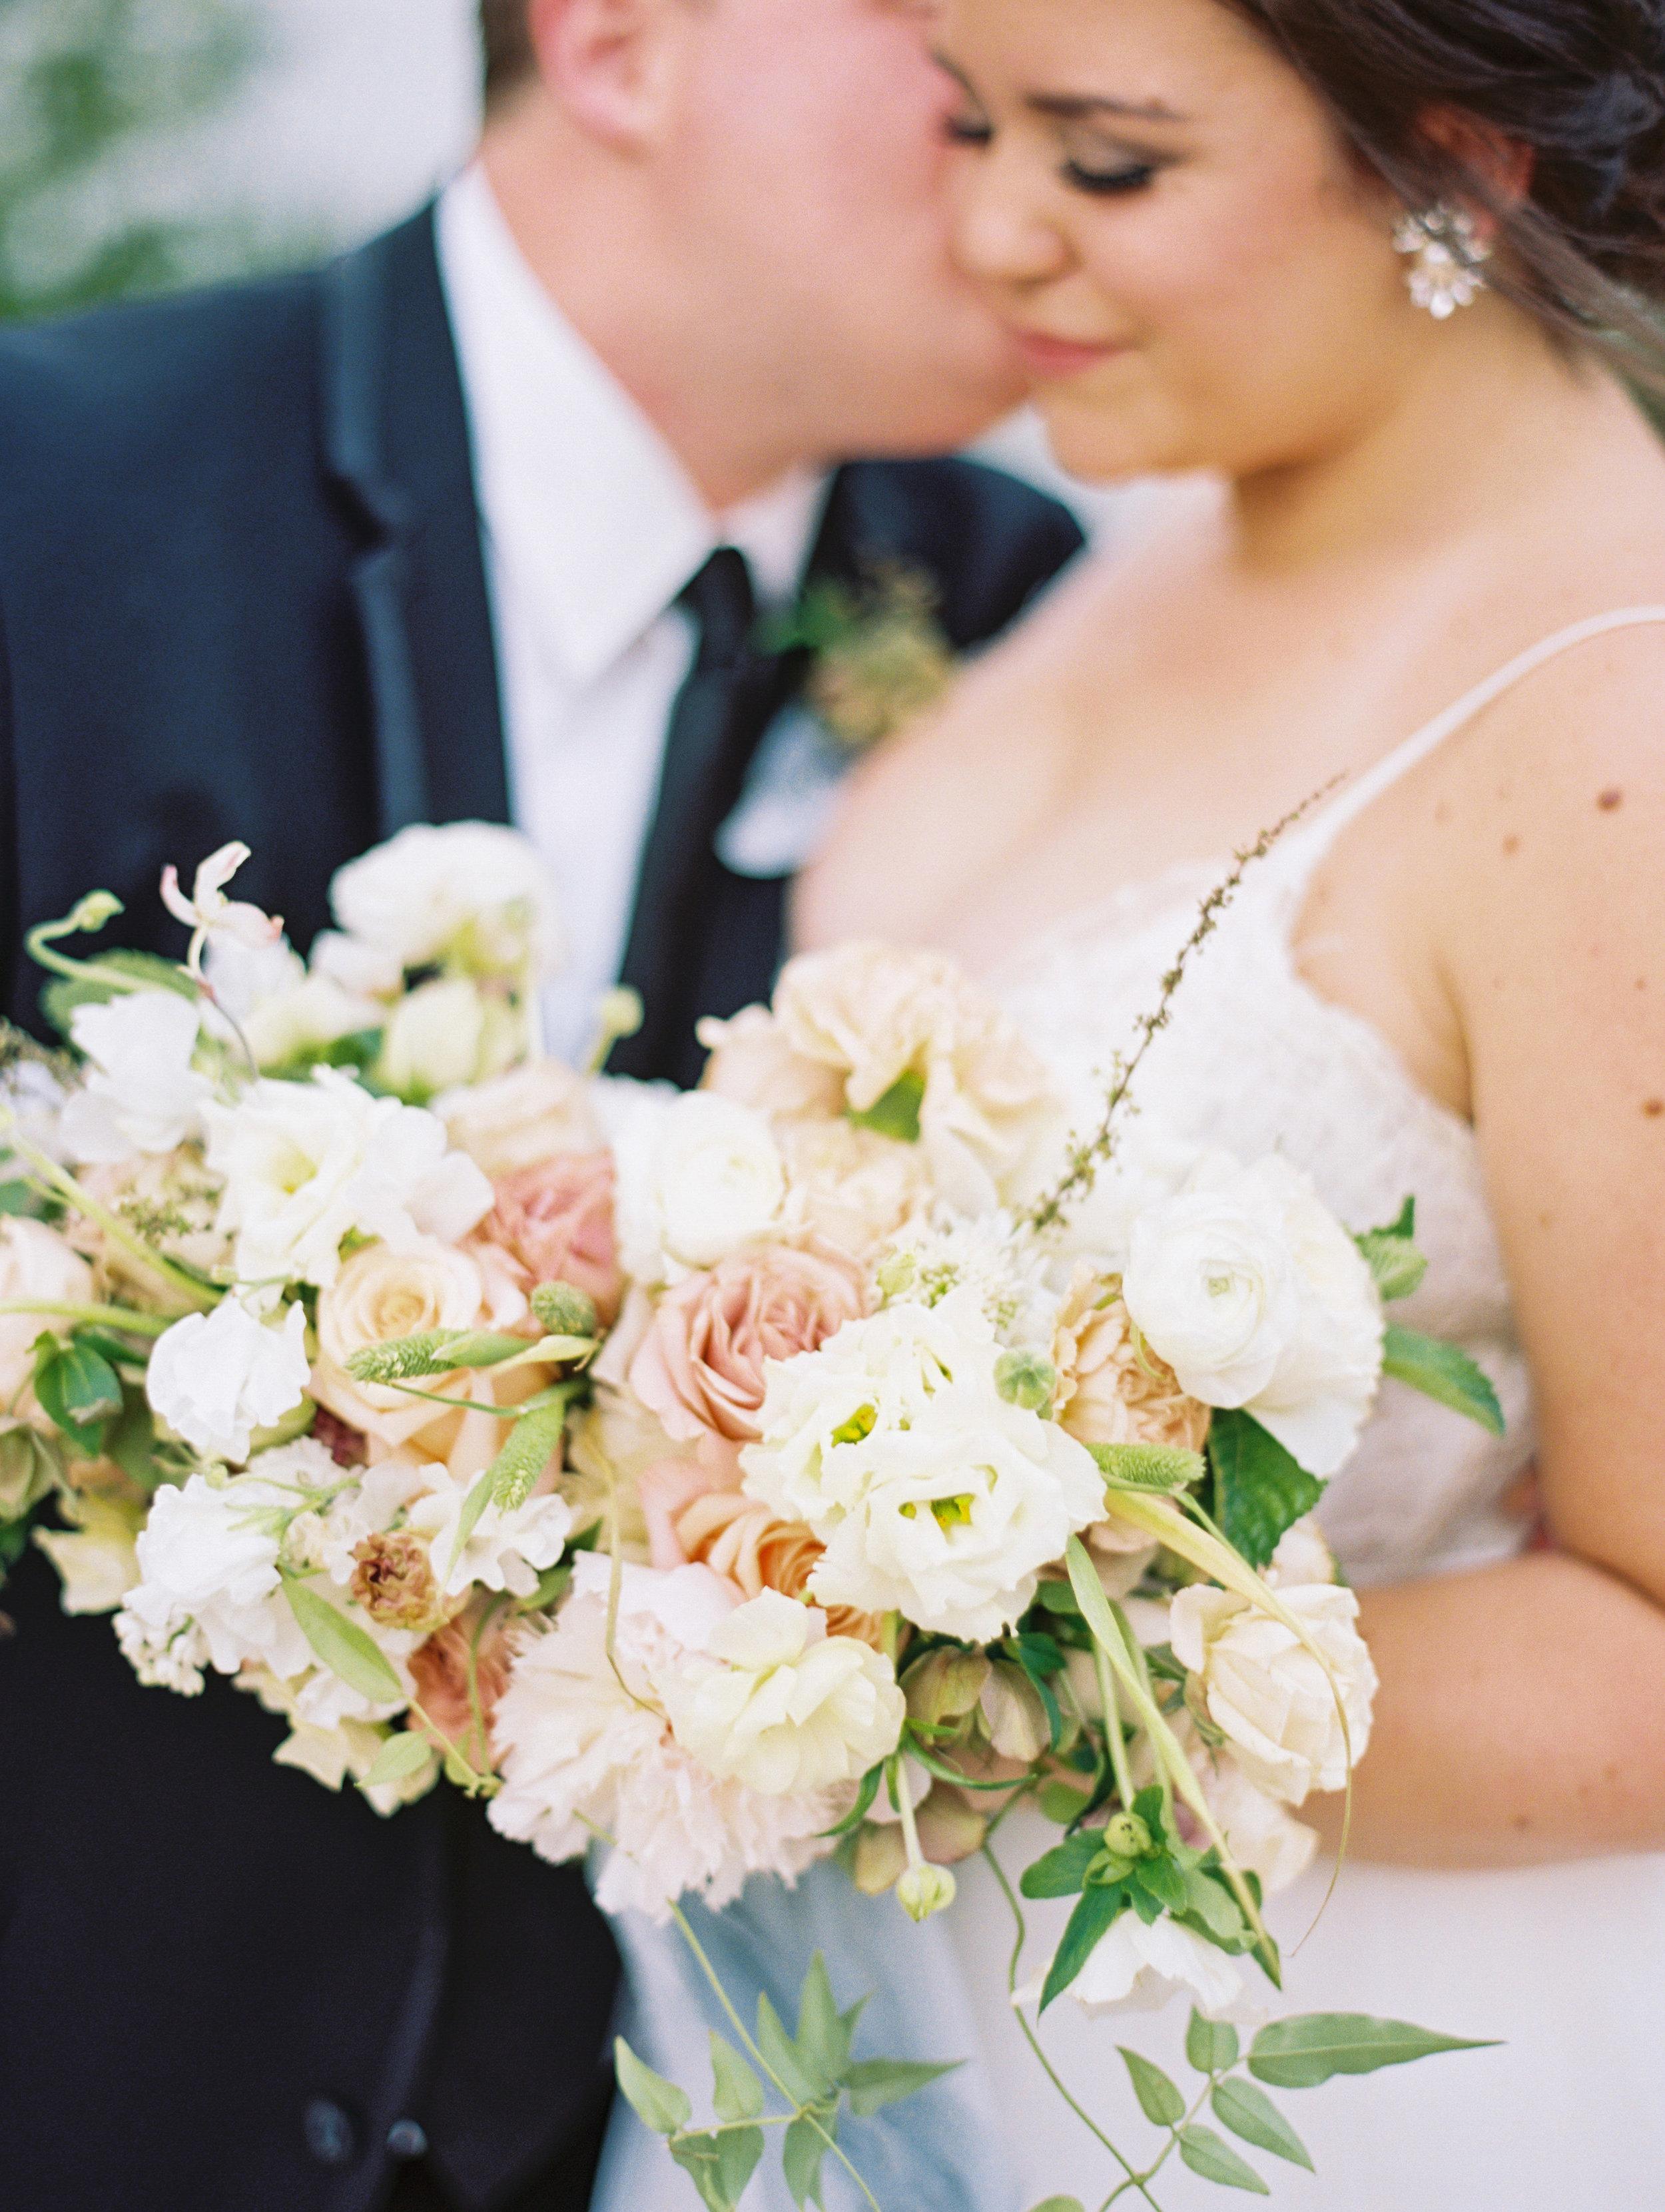 jessica-zimmerman-events-florida-wedding-bouquet.jpg